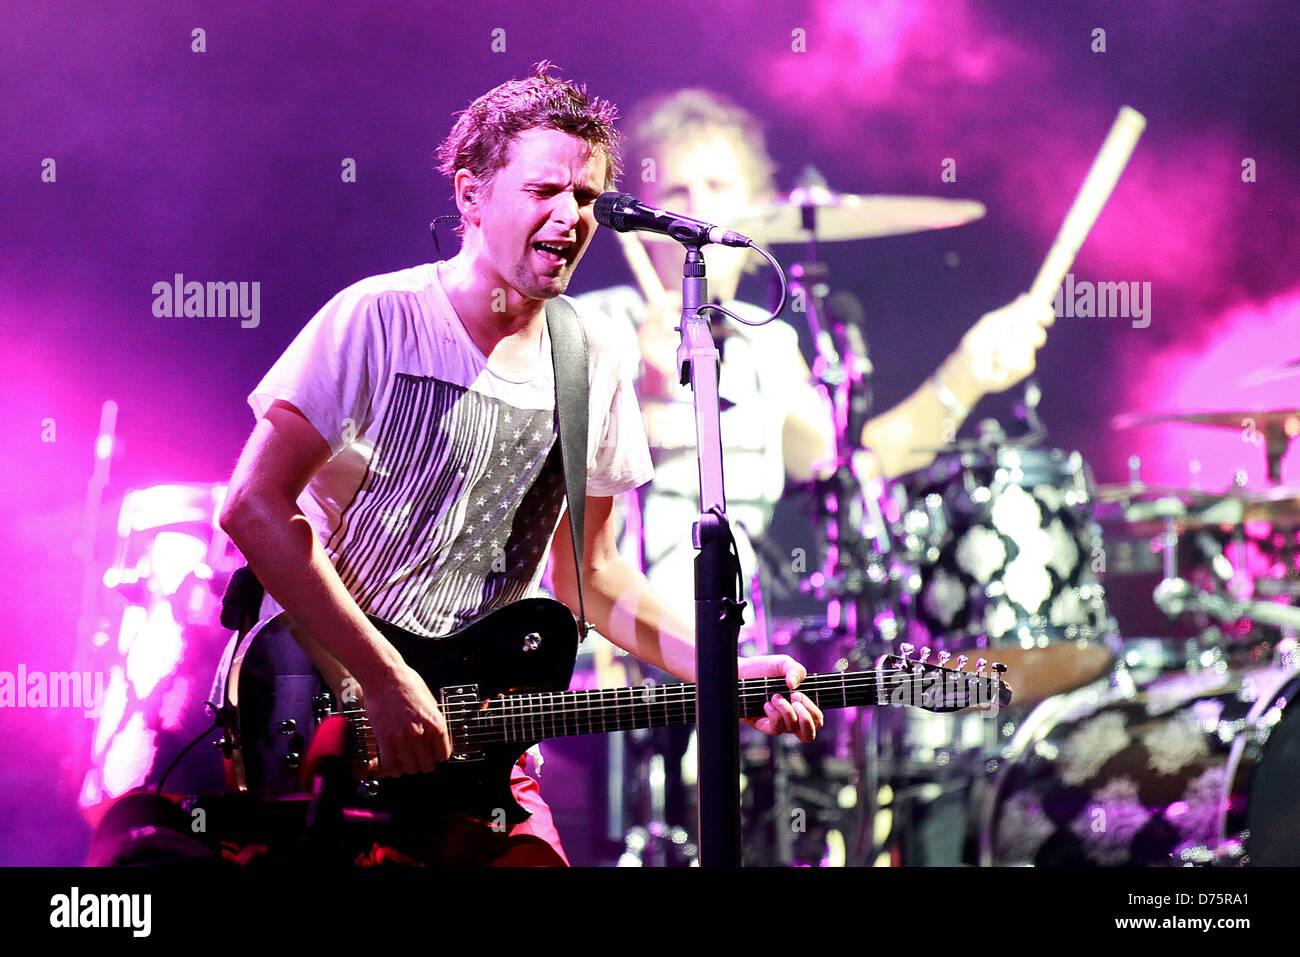 Matthew Bellamy of Muse Lollapalooza Music Festival 2011 - Performances - Day 1 Chicago, Illinois - 05.08.11 - Stock Image